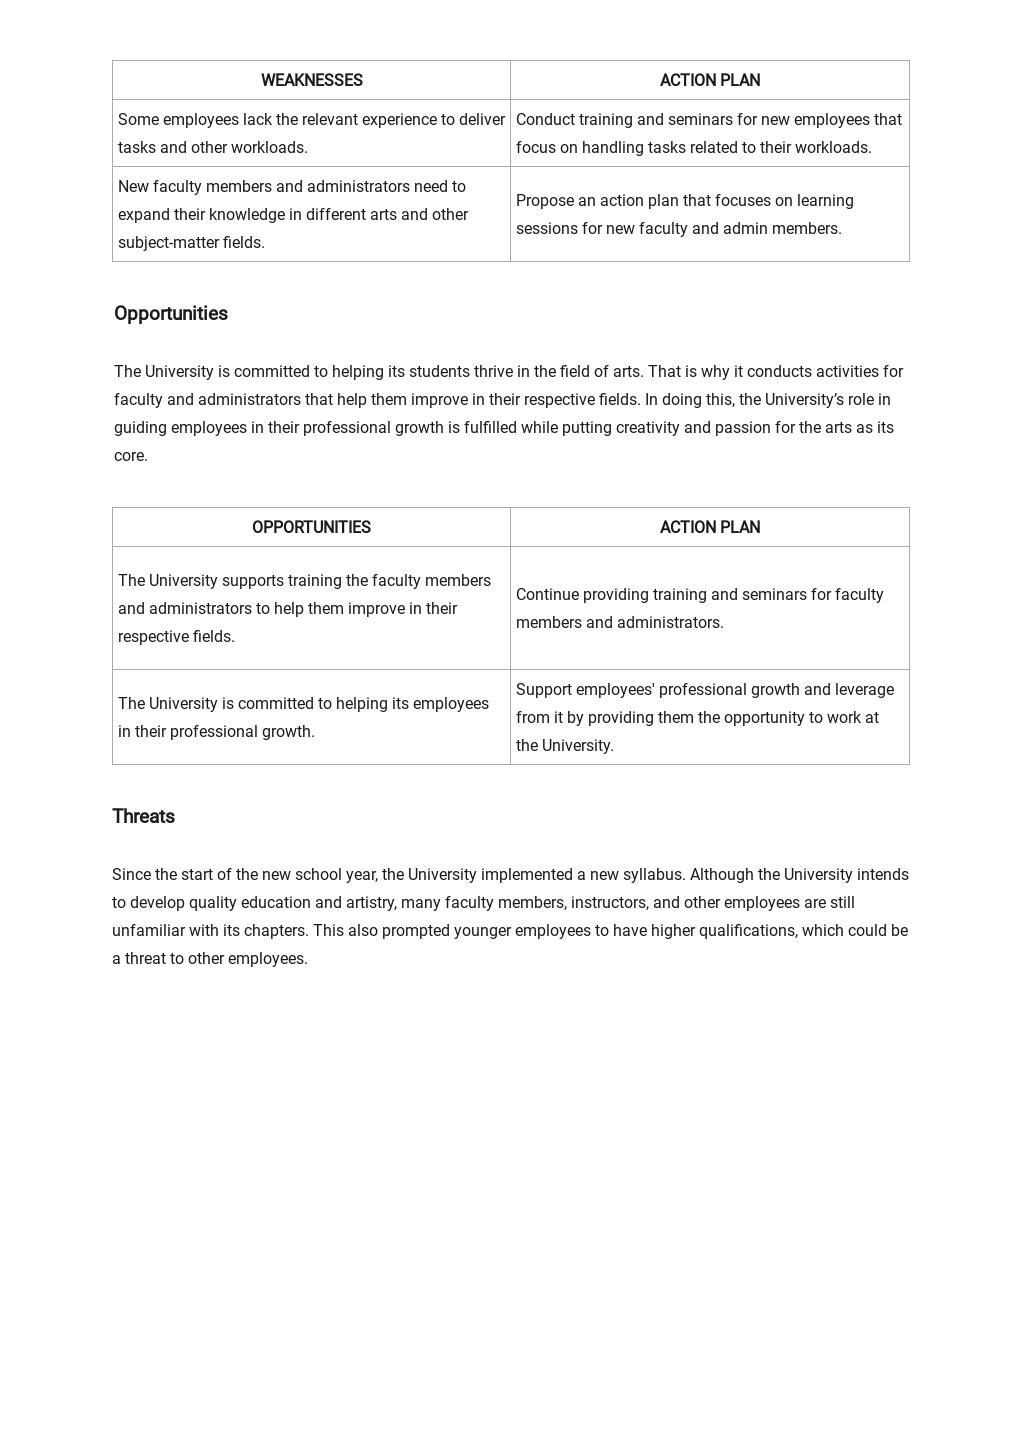 Personal Swot Analysis Template 2.jpe